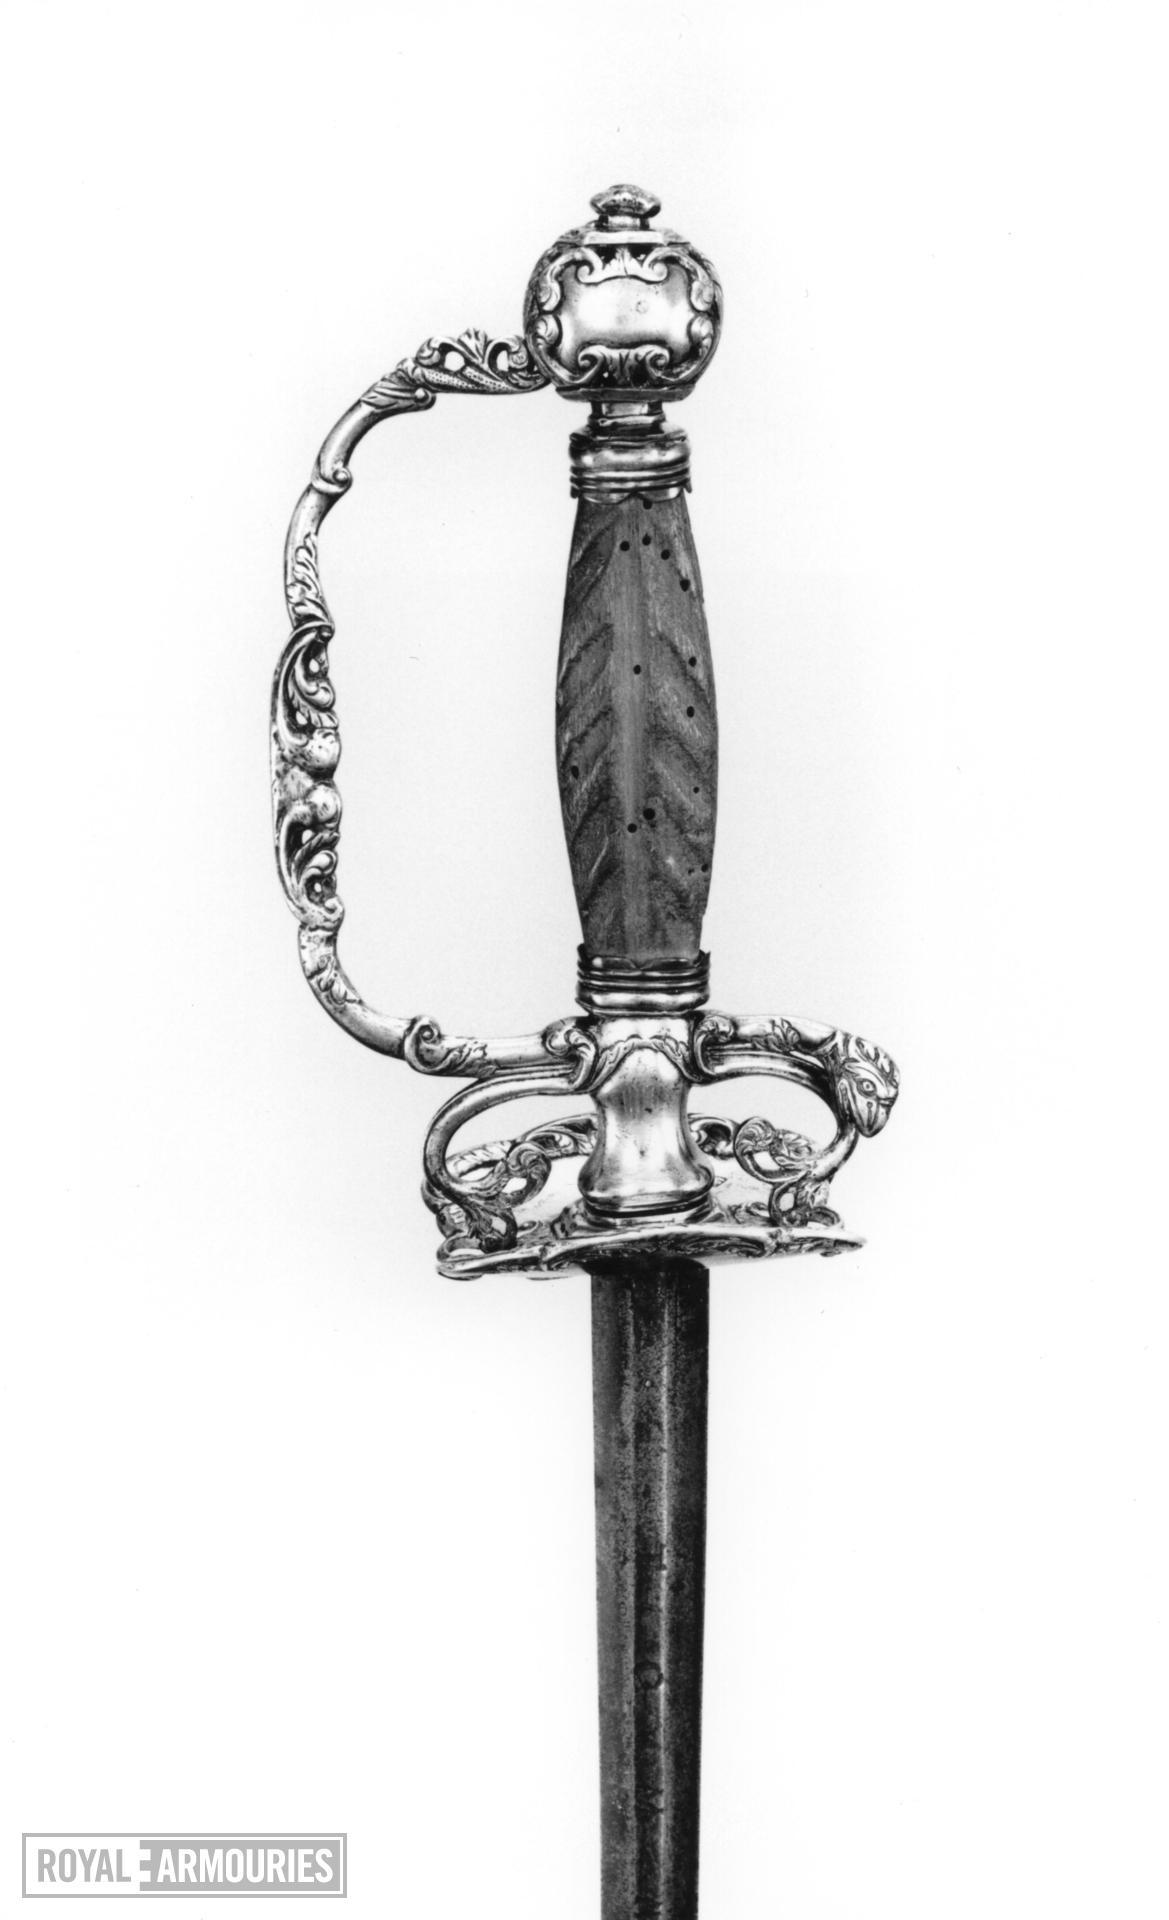 Sword Small-sword. Maker's mark RE in rectangle, probably Joseph Reason